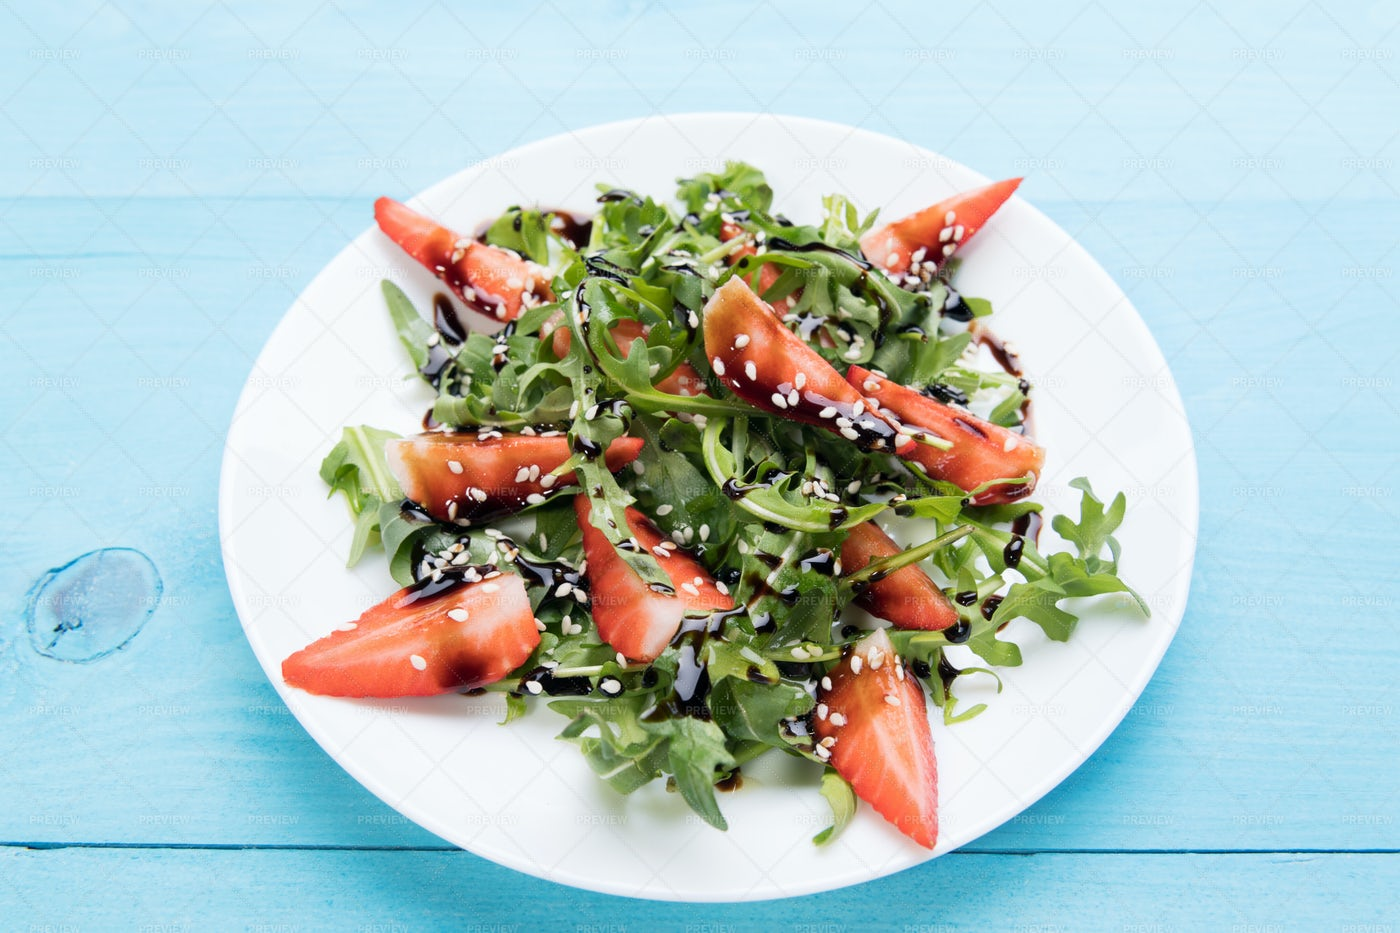 Arugula Salad With Strawberries: Stock Photos